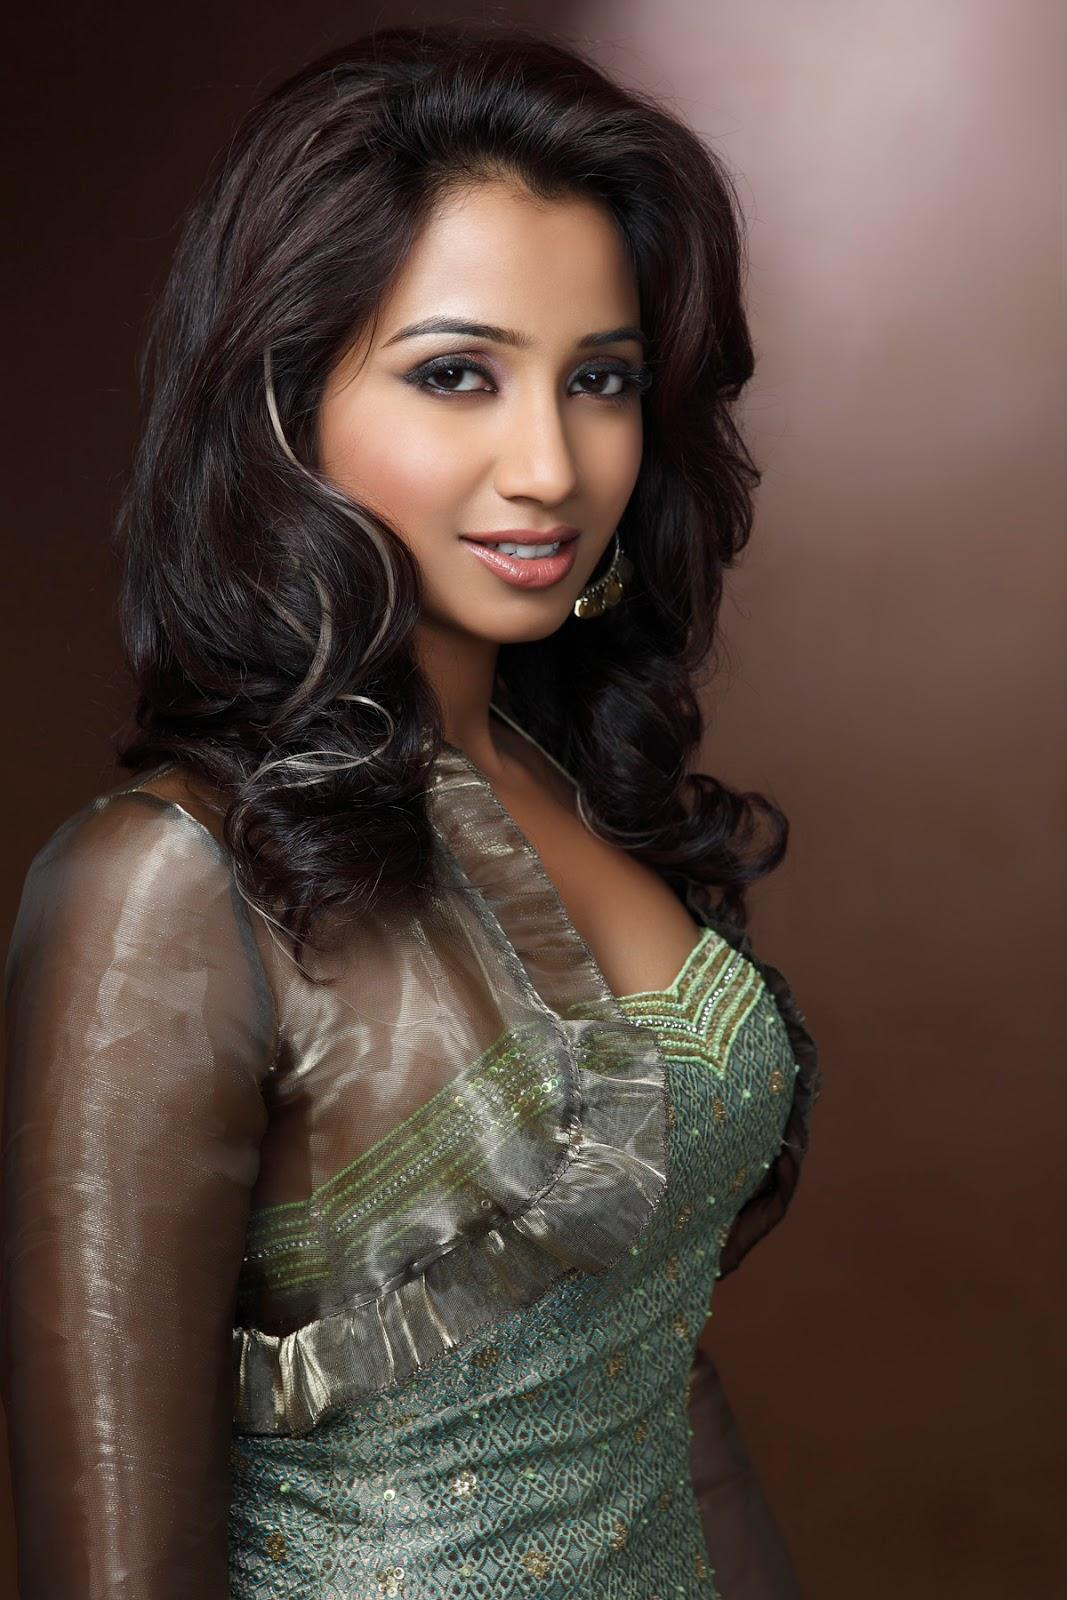 Bollywood Pics Pix4World Shreya Ghoshal Hot And Sexy Hd Wallpapers-3808